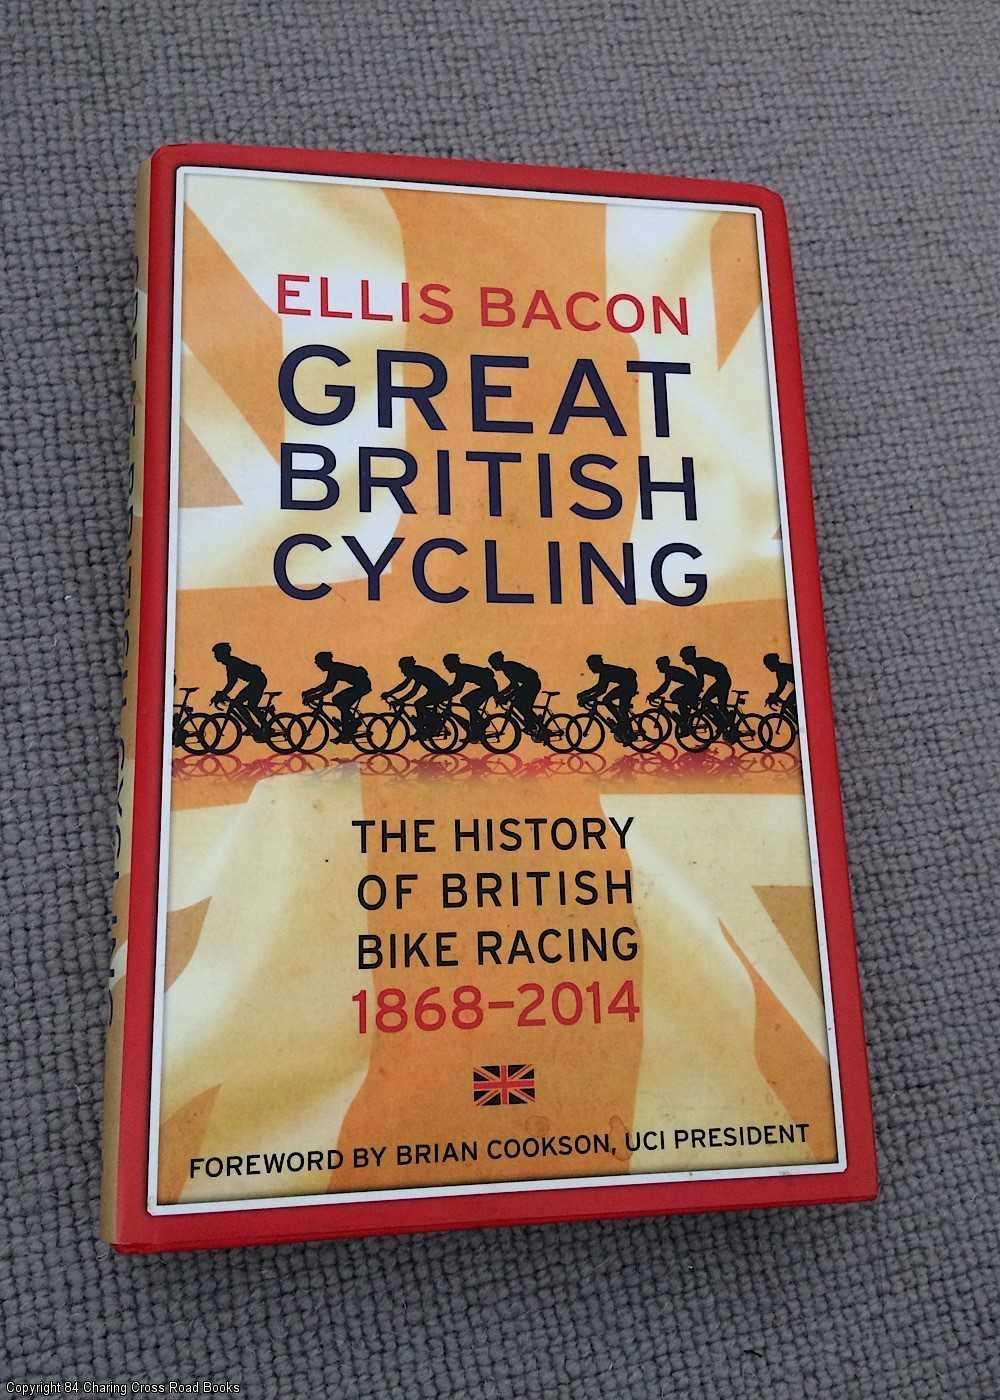 BACON, ELLIS - Great British Cycling: The History of British Bike Racing 1868 - 2014